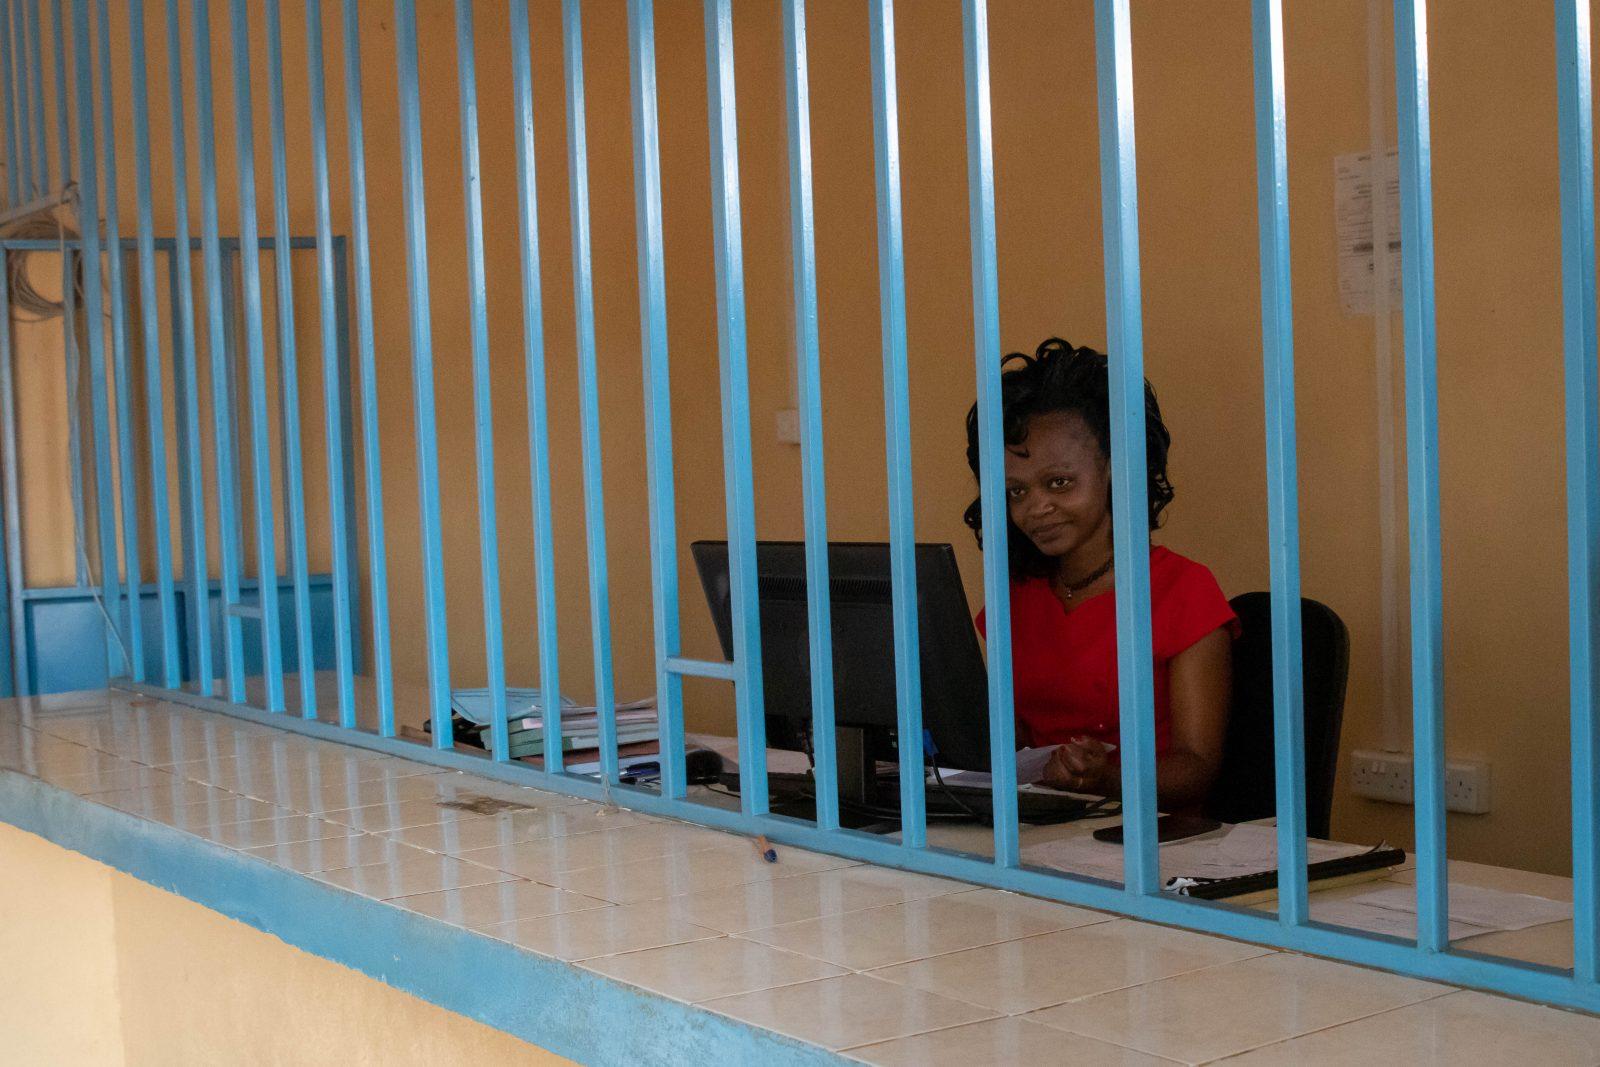 Damen bakom disken i mikrolånbanken i Kamuwongo.